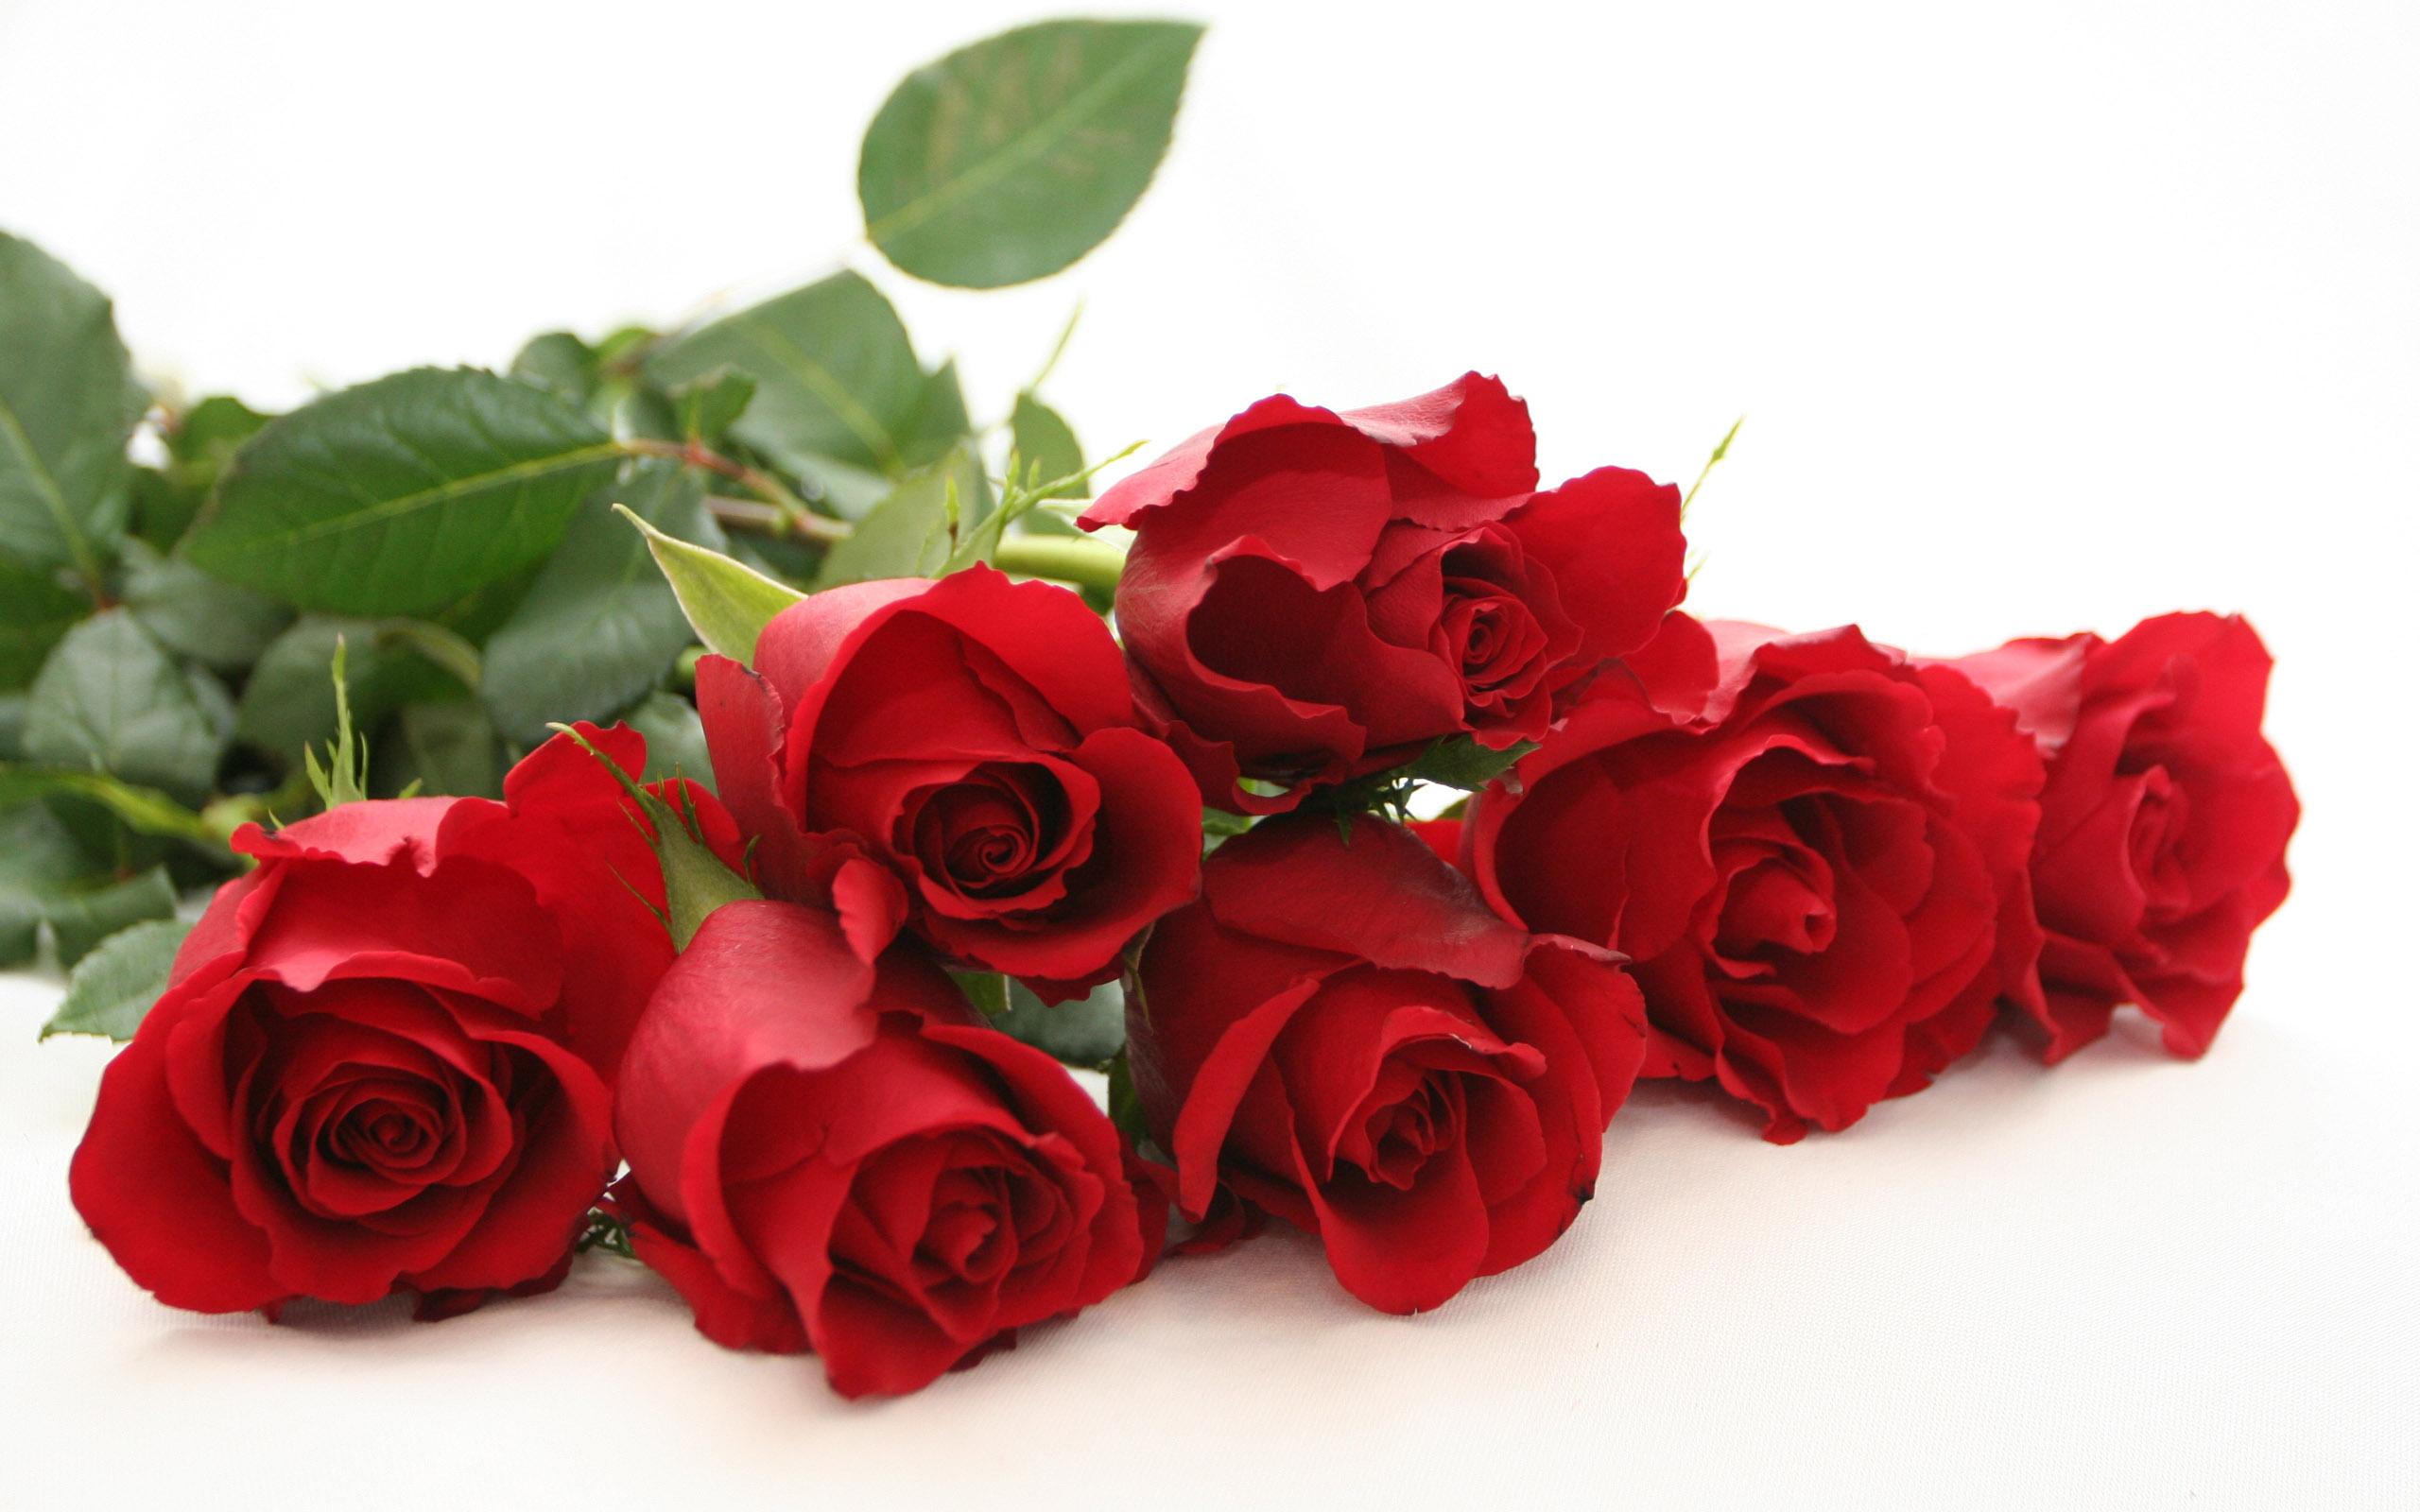 rose flower wallpaper hd